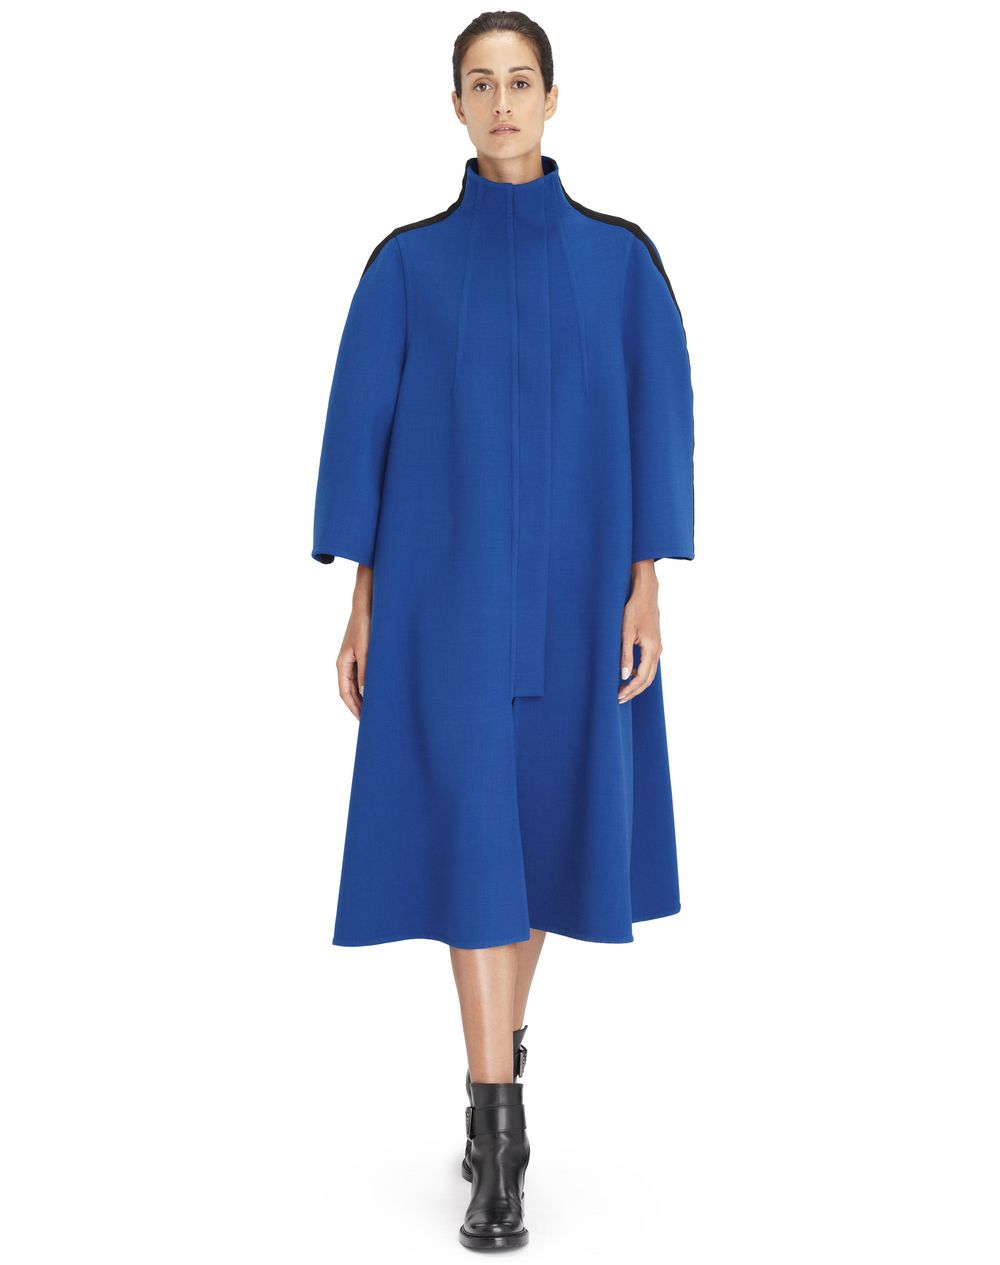 LONG INDIGO BLUE COAT - Lanvin